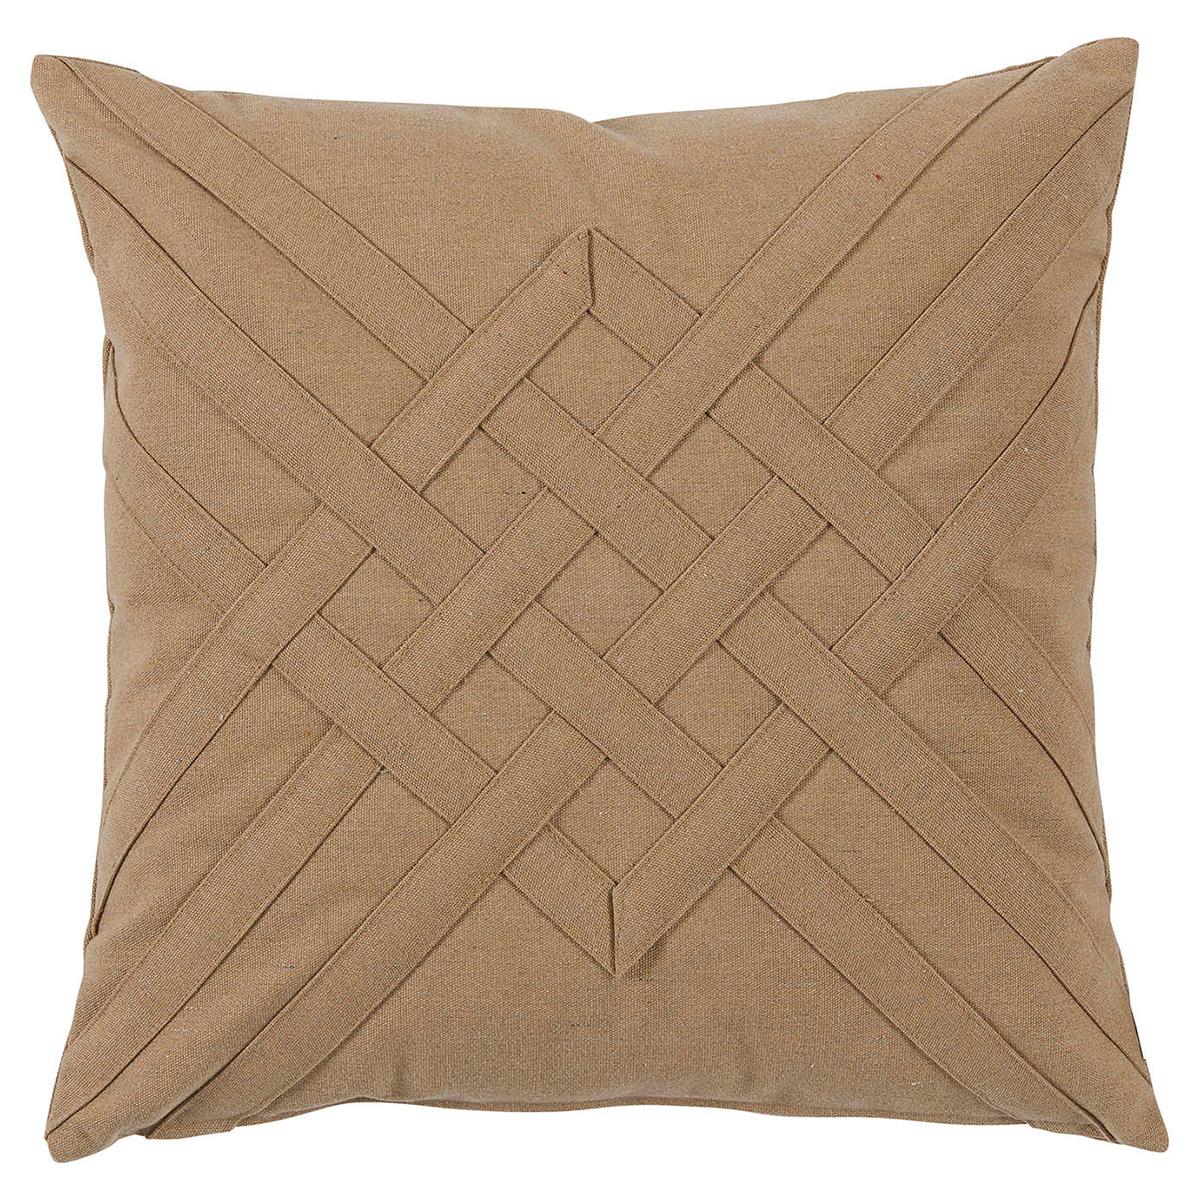 Will Modern Tan Lattice Weave Outdoor Pillow - 20x20